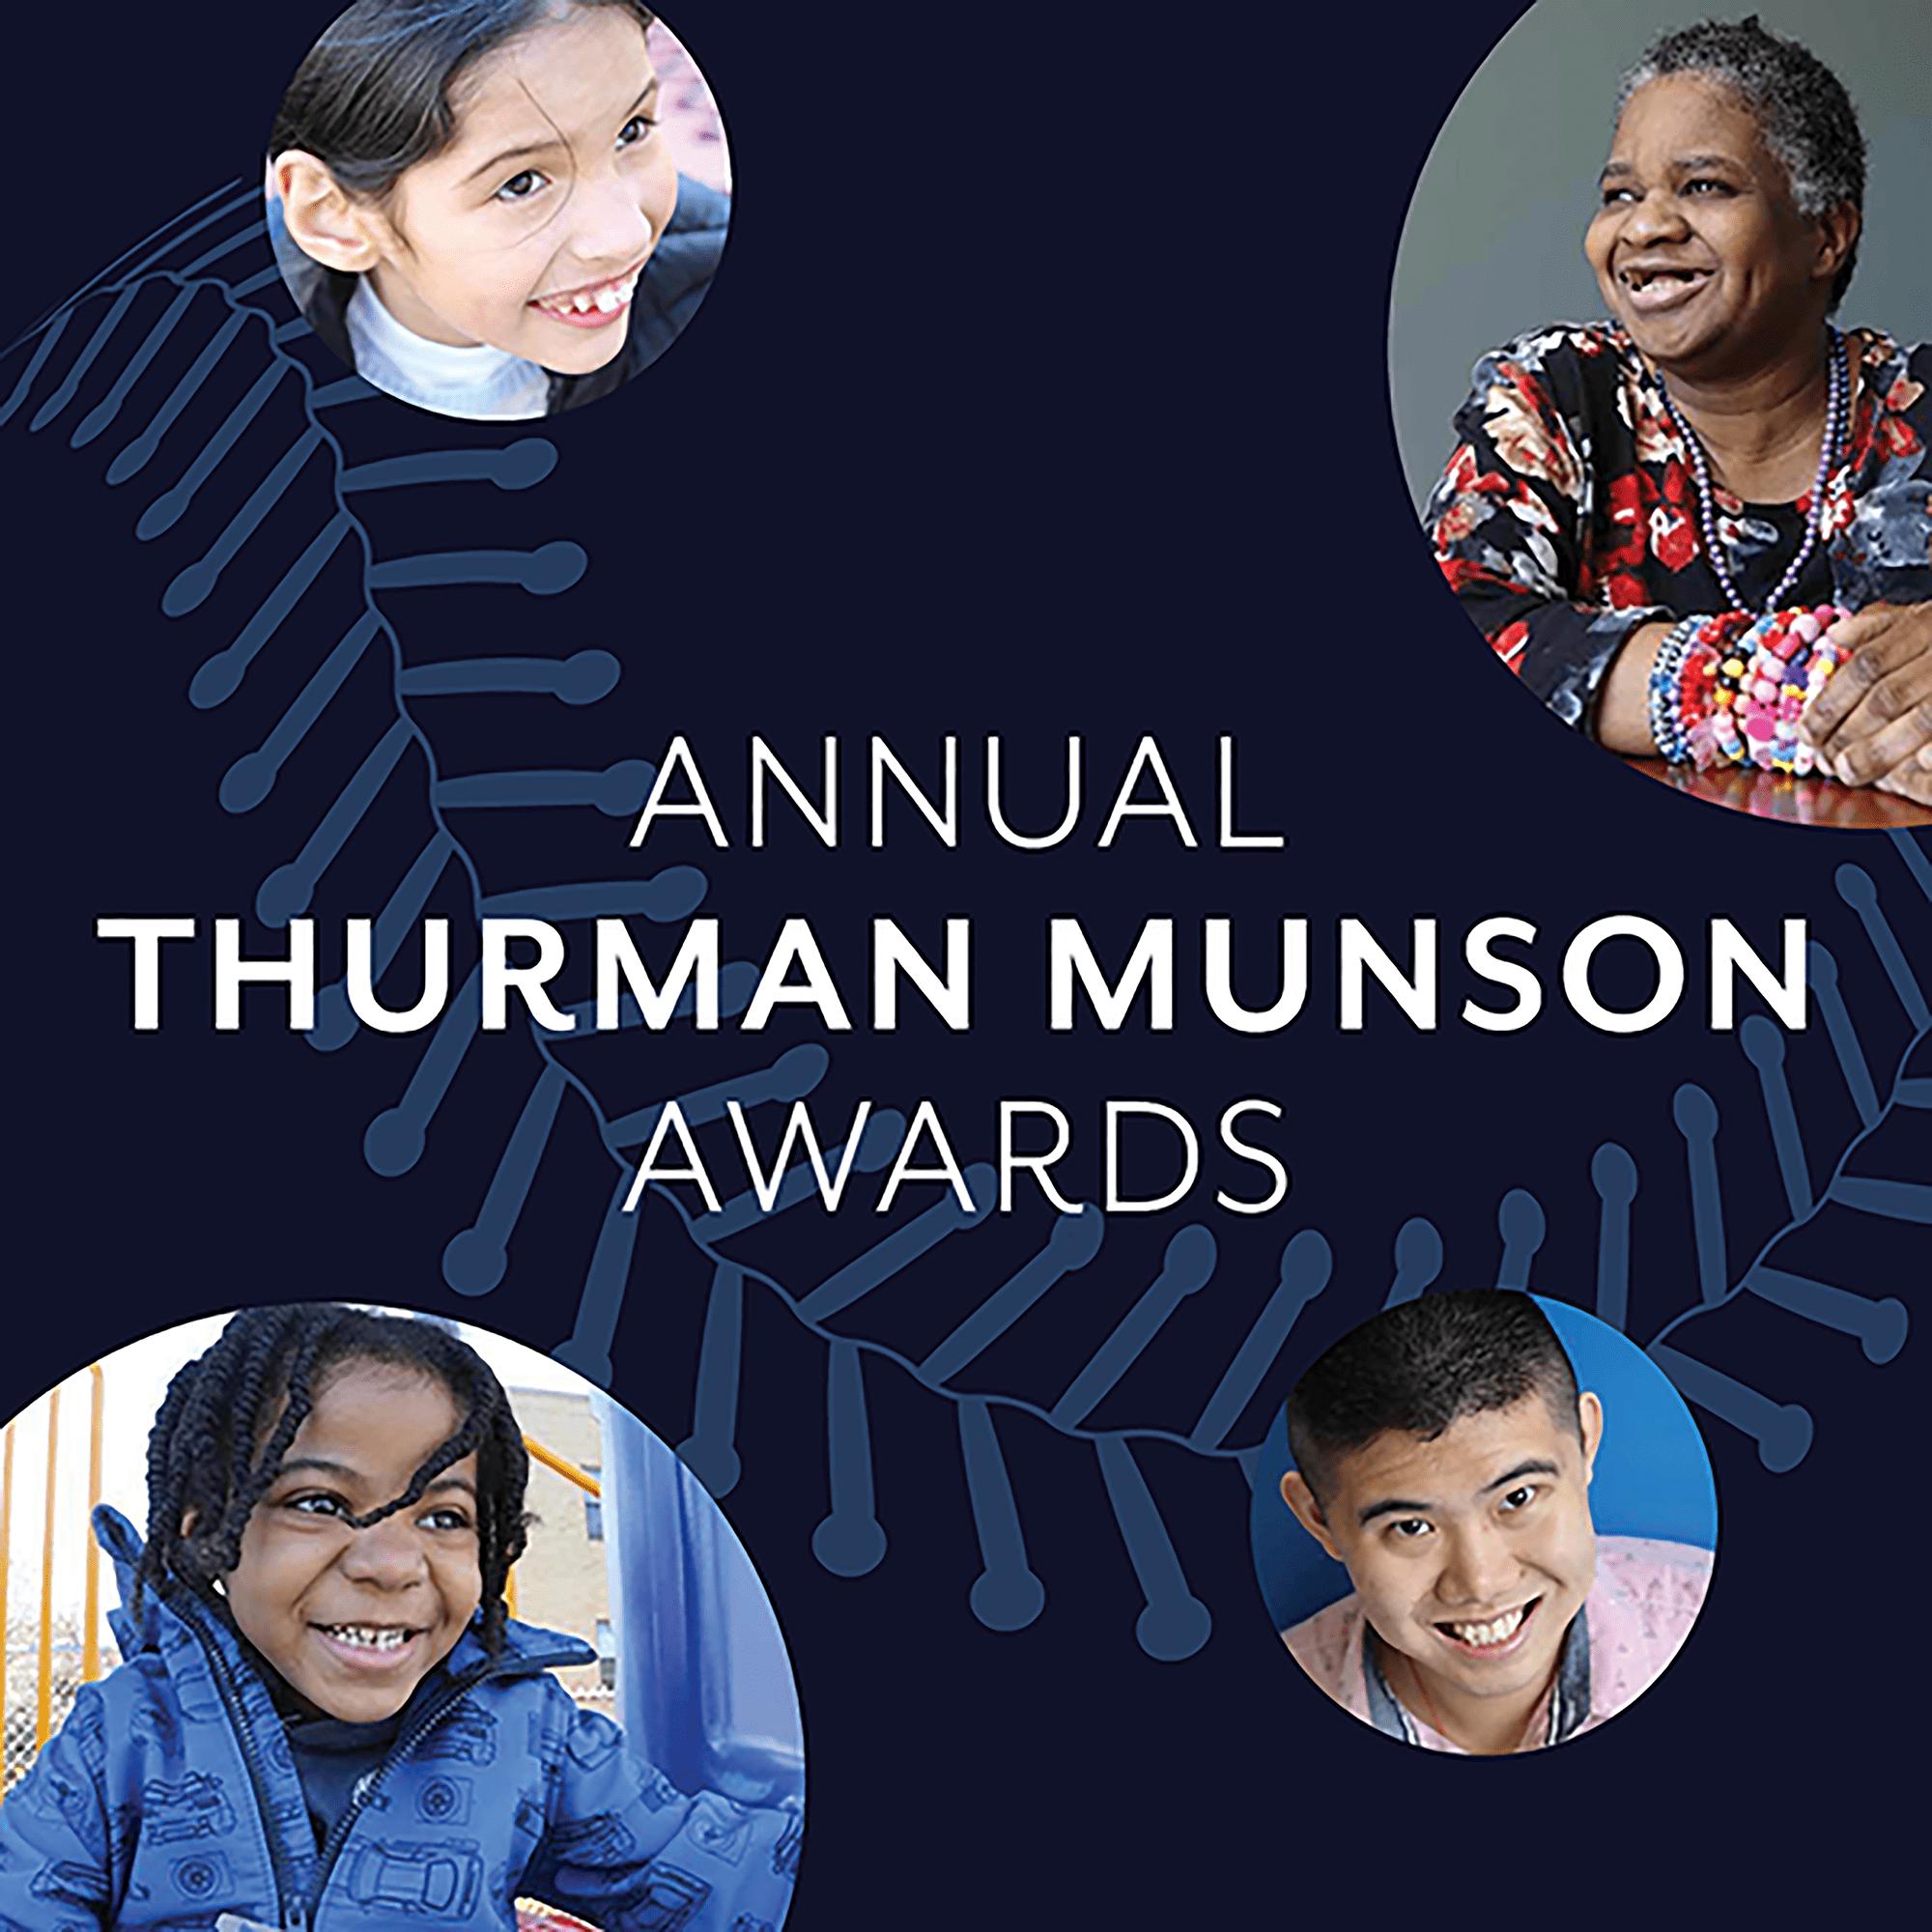 AHRC NYC's Thurman Munson Awards took place on February 2, 2021.